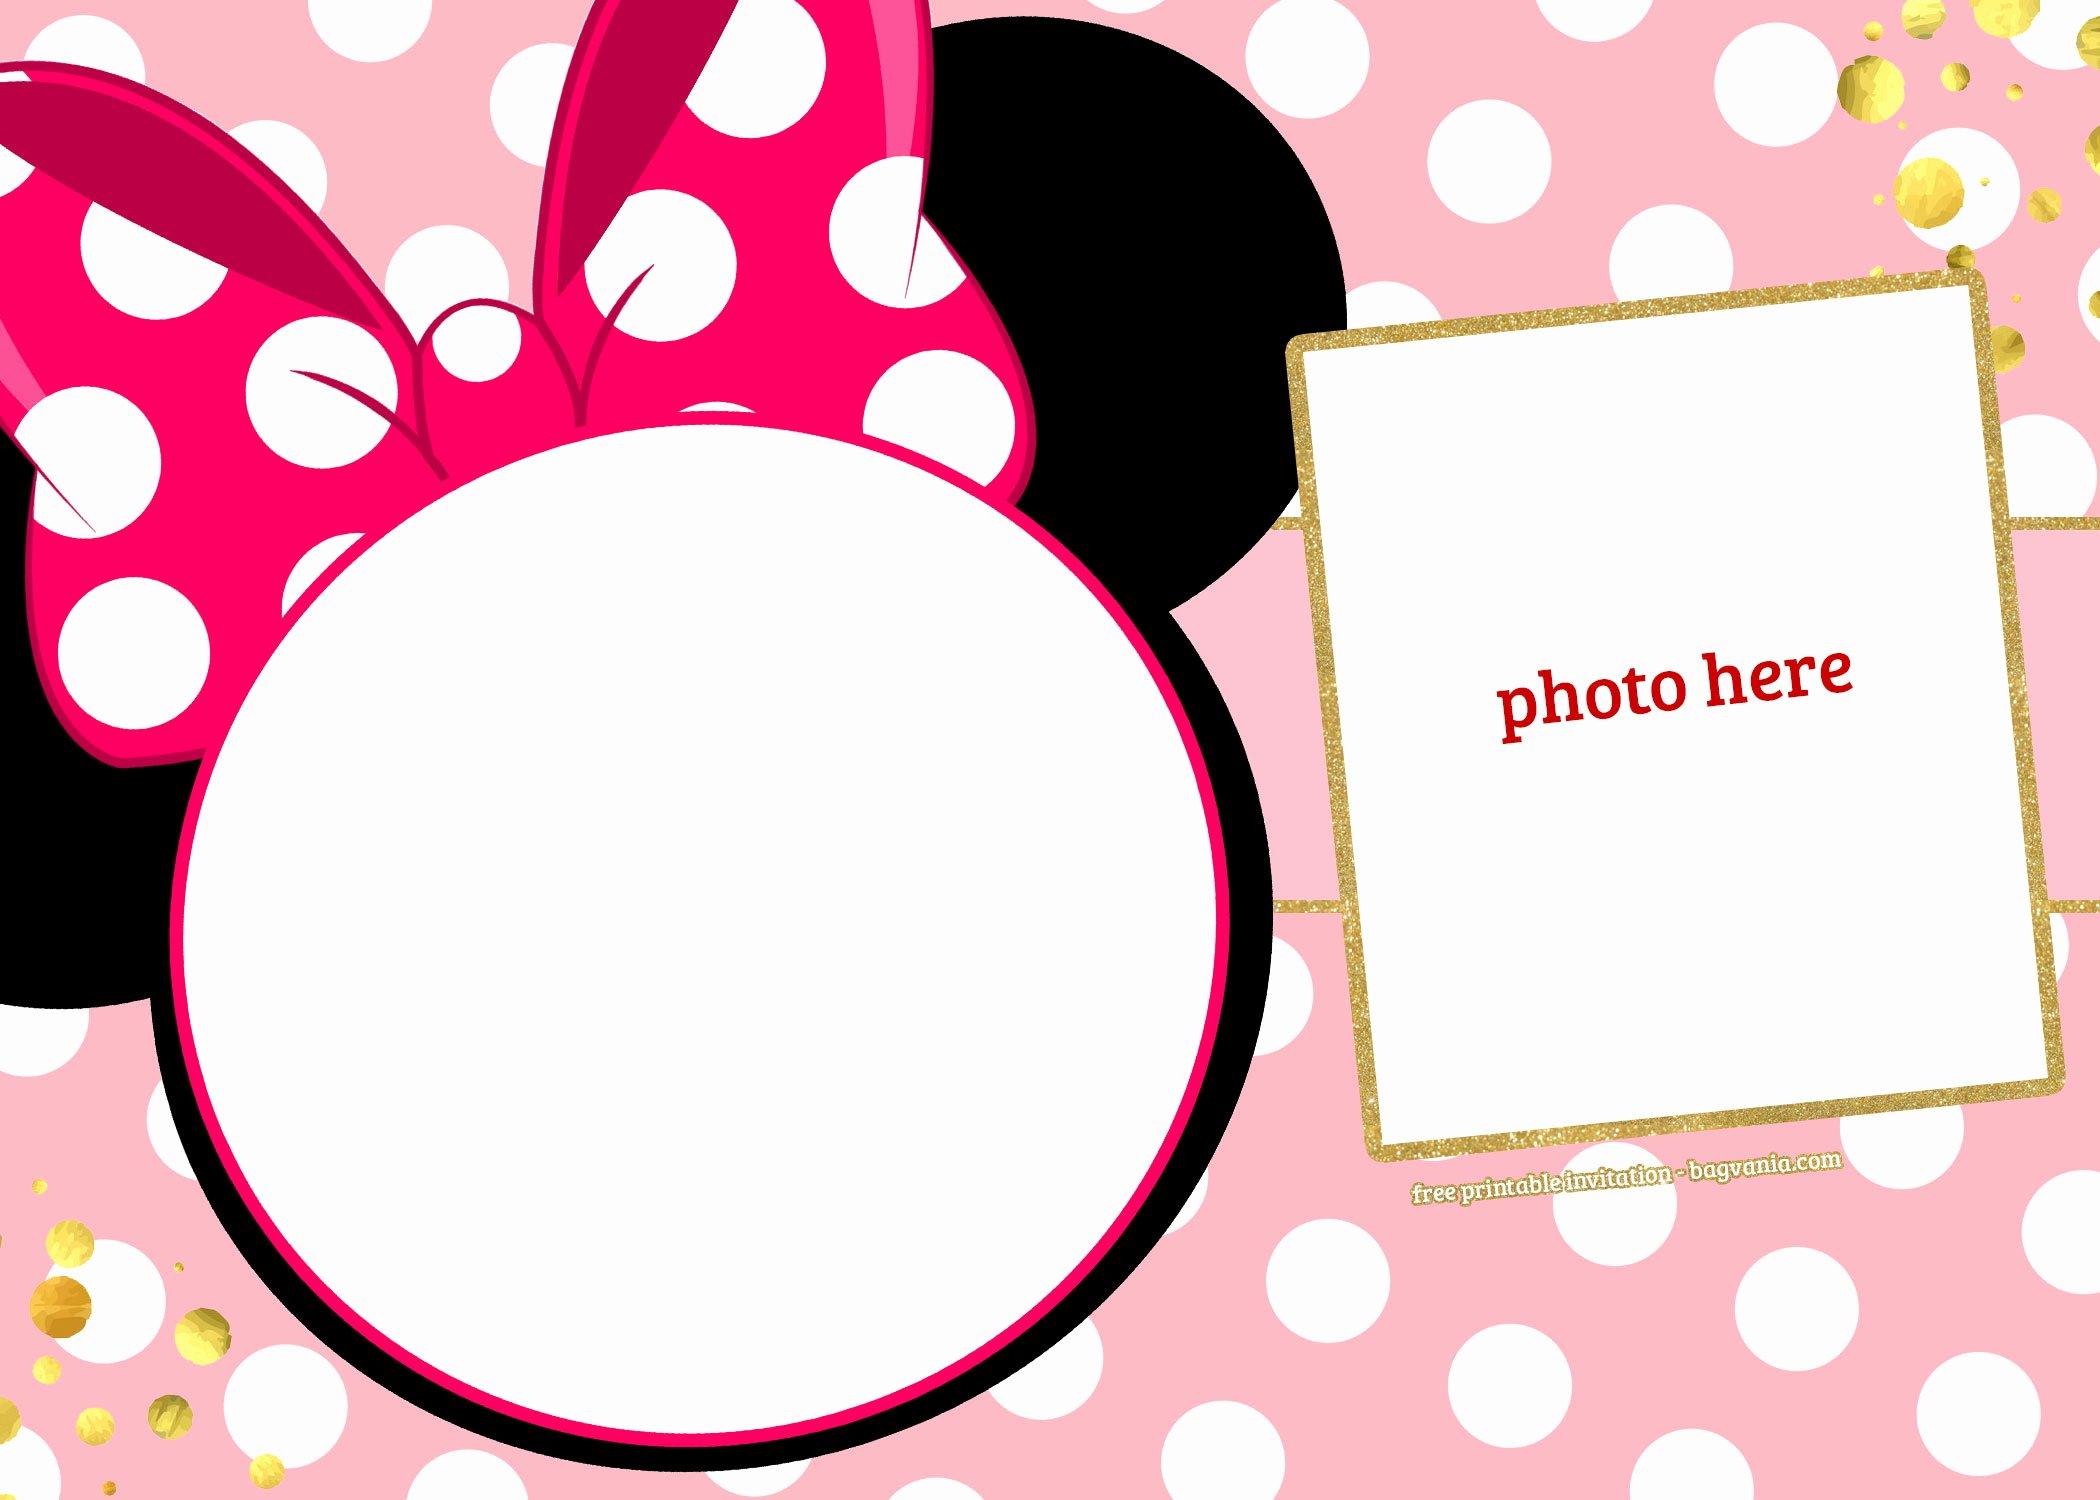 Editable Minnie Mouse Birthday Invitations Elegant Free Printable Minnie Mouse Pinky Birthday Invitation Template